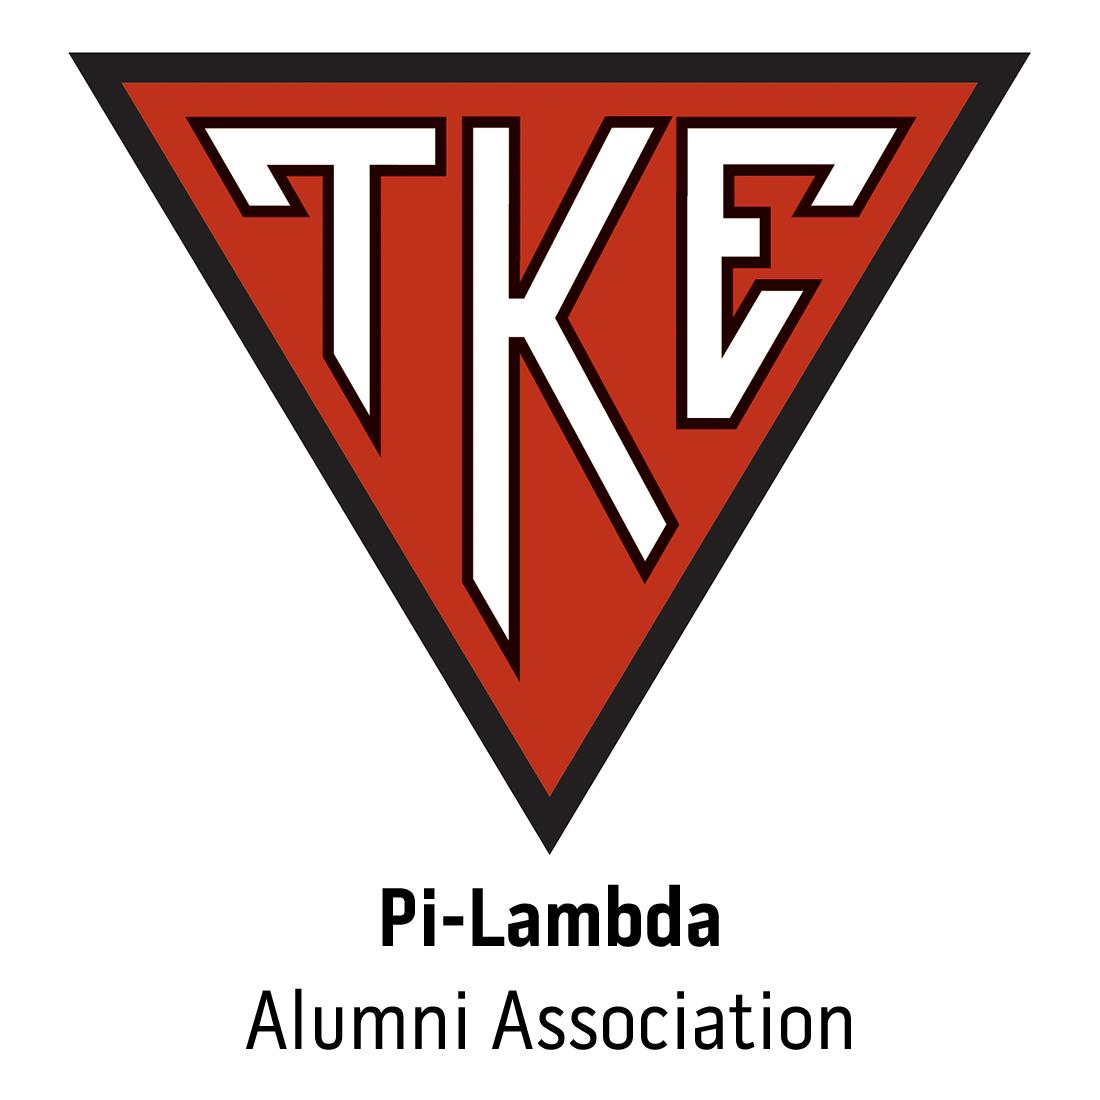 Pi-Lambda Alumni Association at University of Nevada, Las Vegas